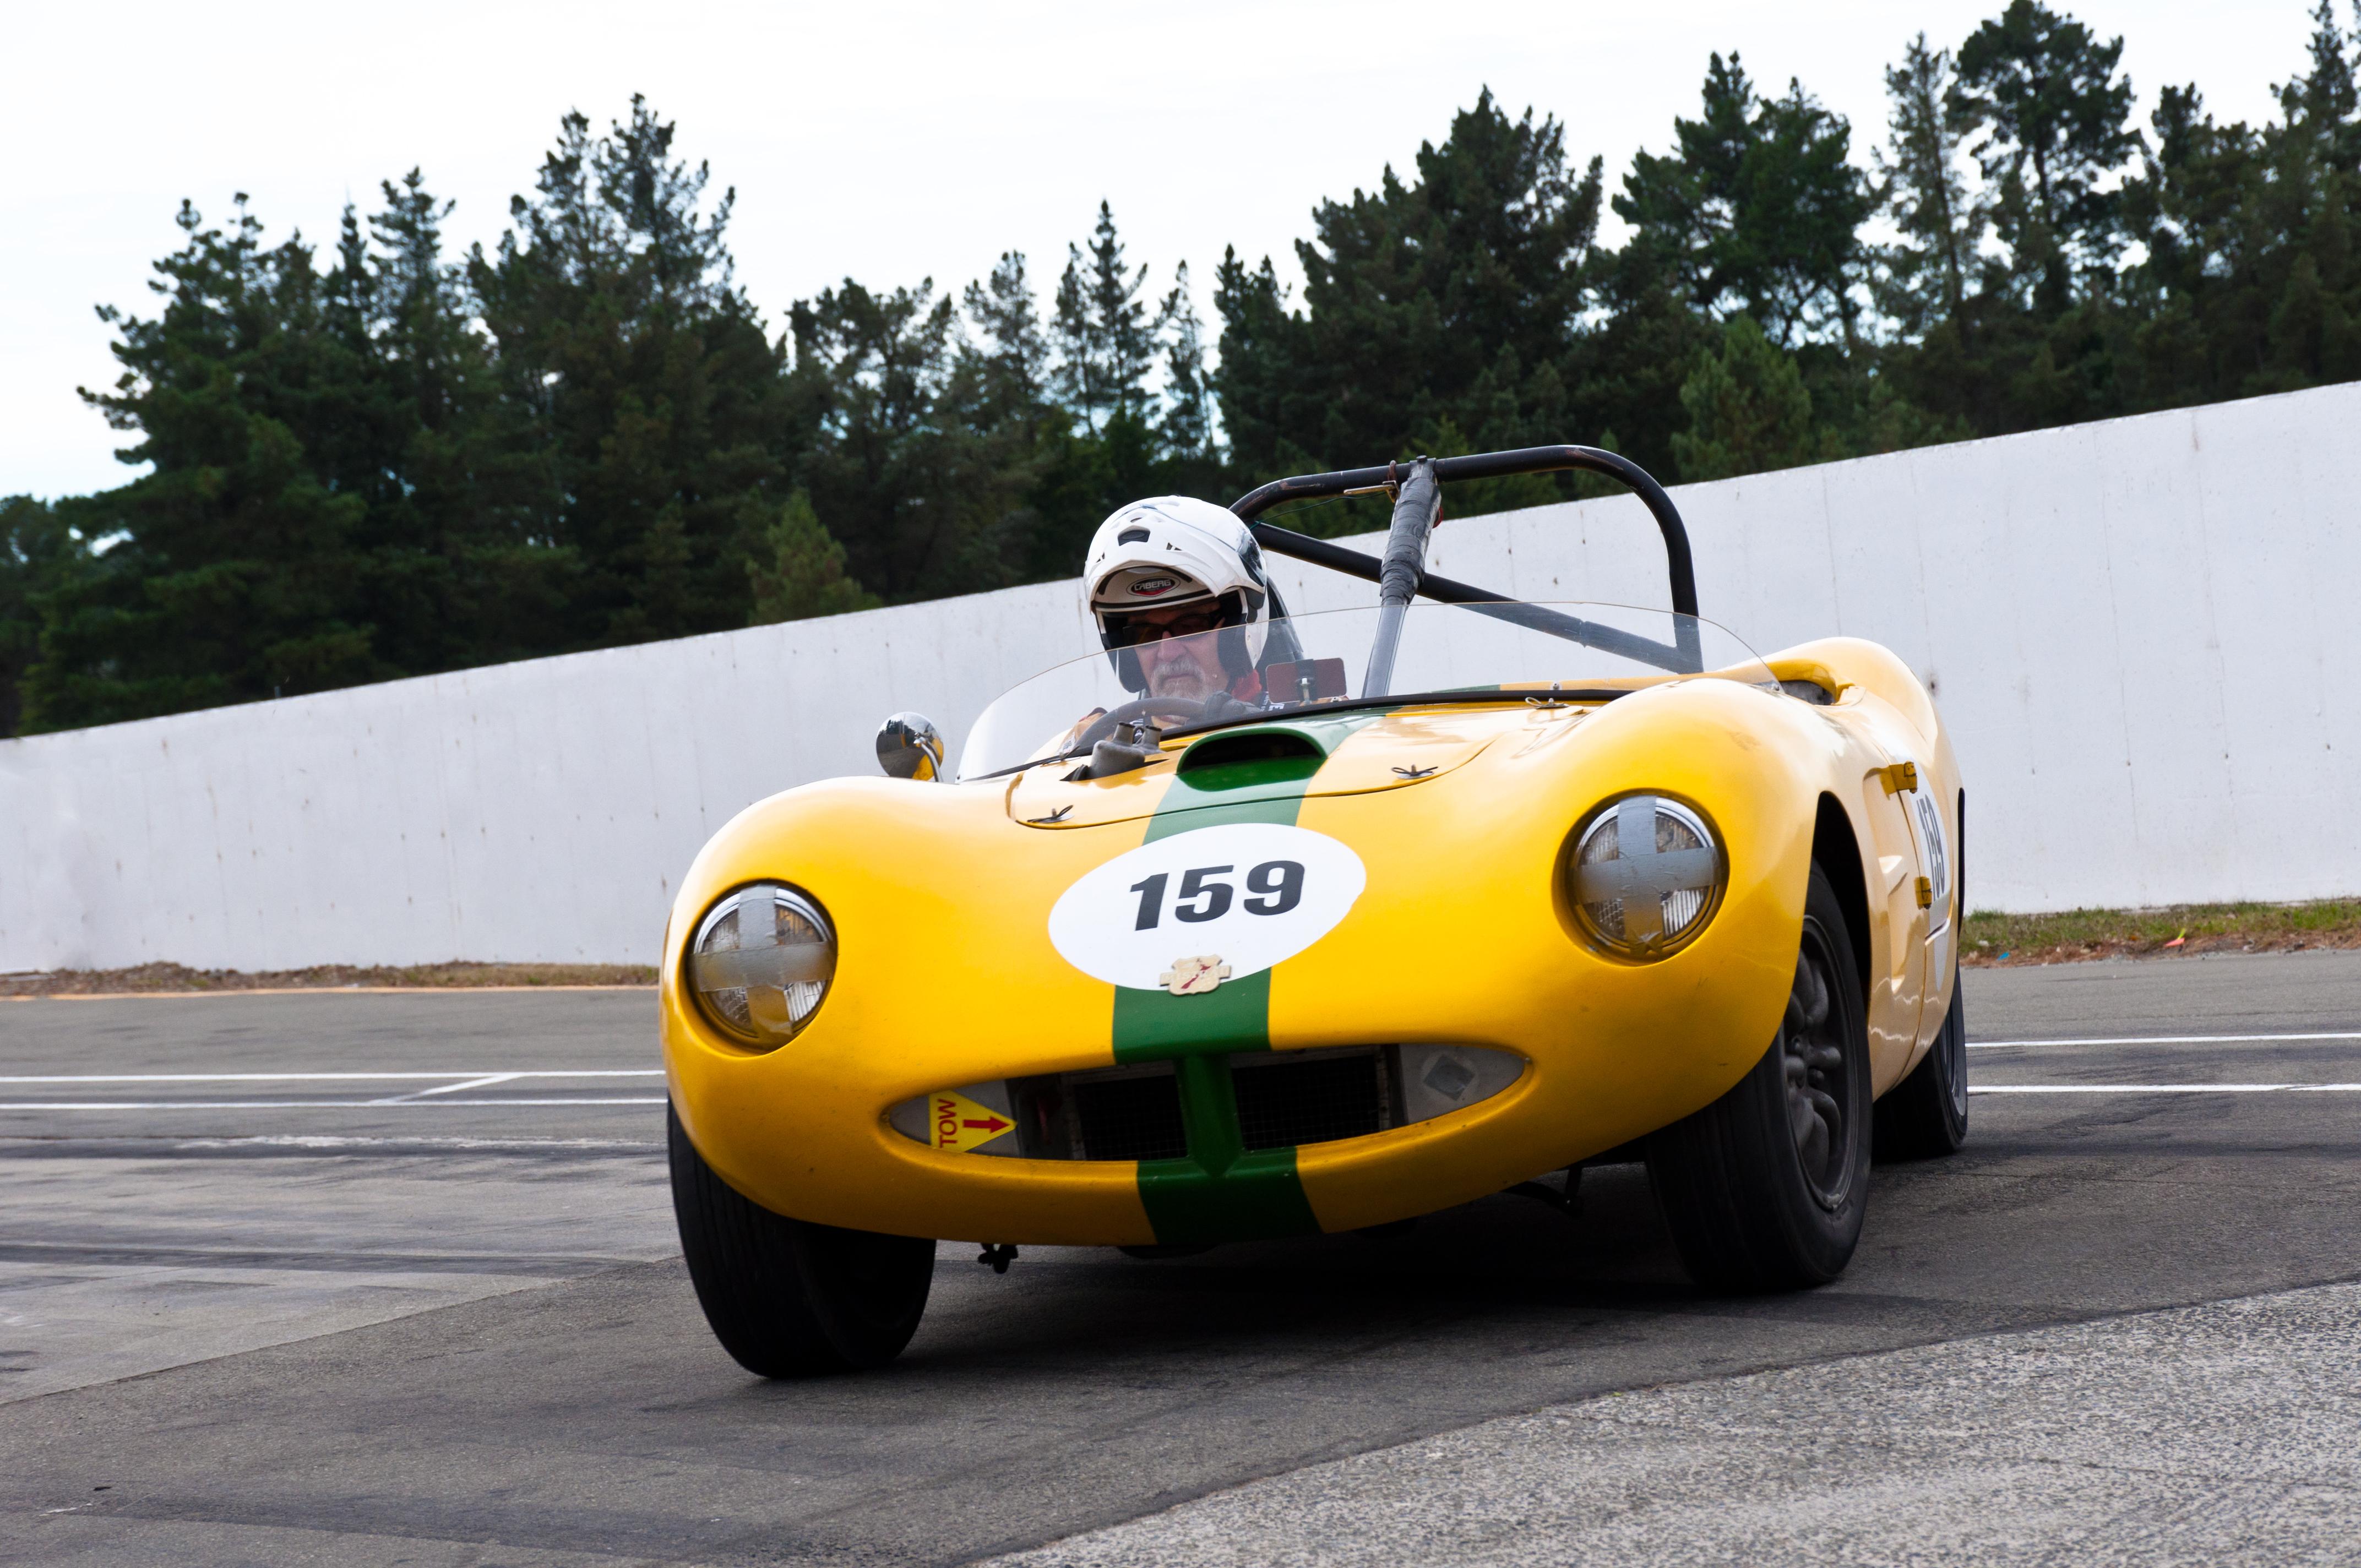 Mistral Special 1959, 1959, Auto, Car, Christchurch, HQ Photo